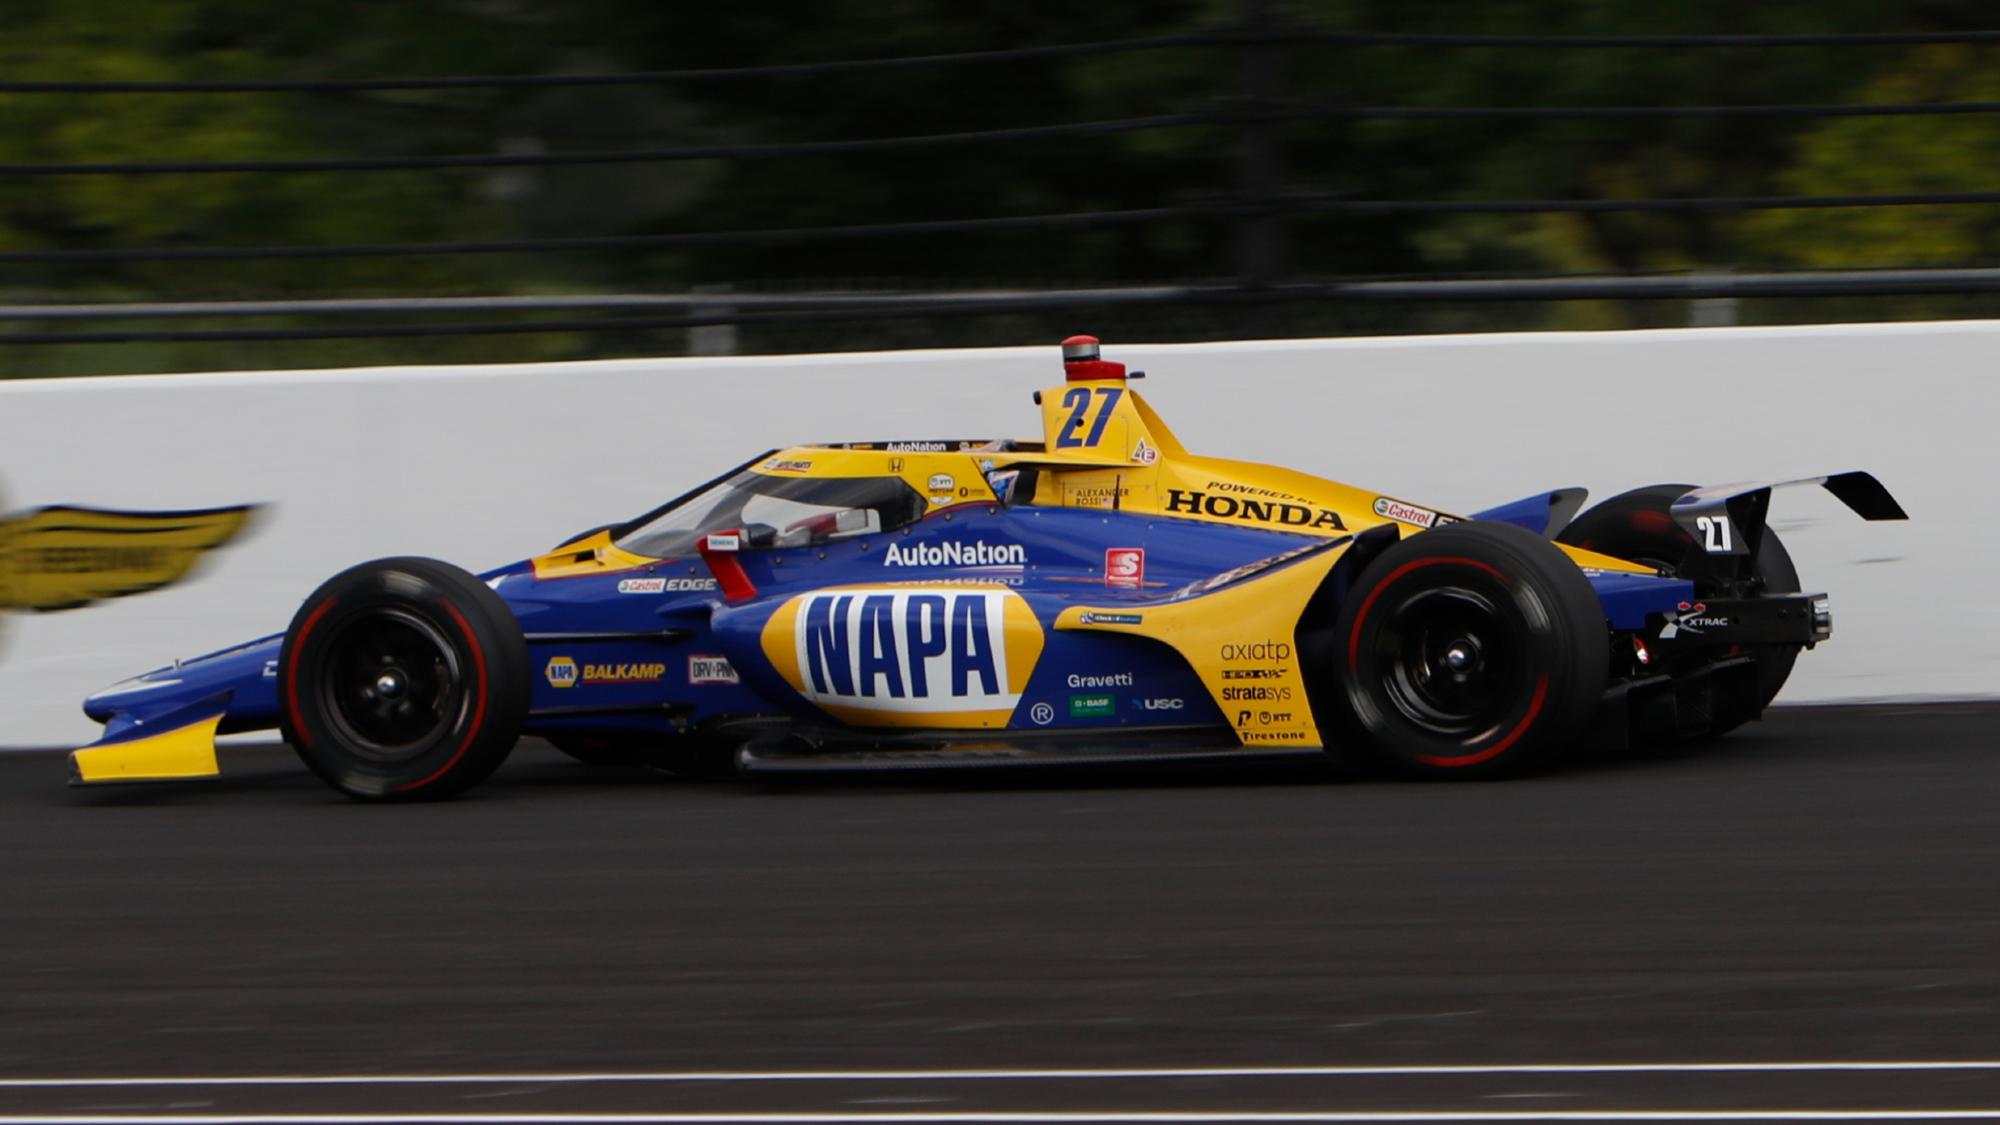 Alexander Rossi, 2020 Indy 500